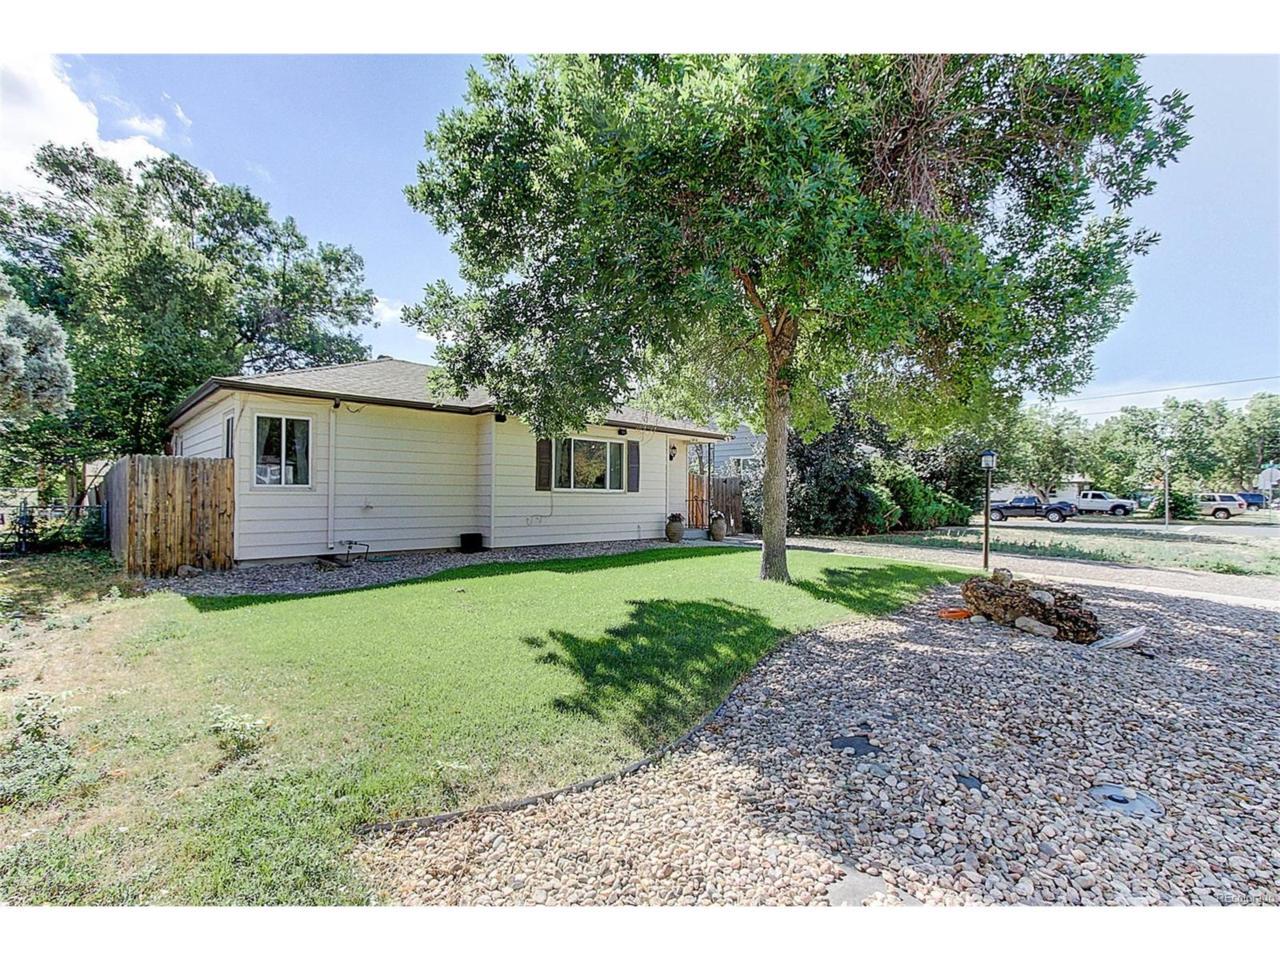 808 Fulton Street, Aurora, CO 80010 (MLS #9809218) :: 8z Real Estate